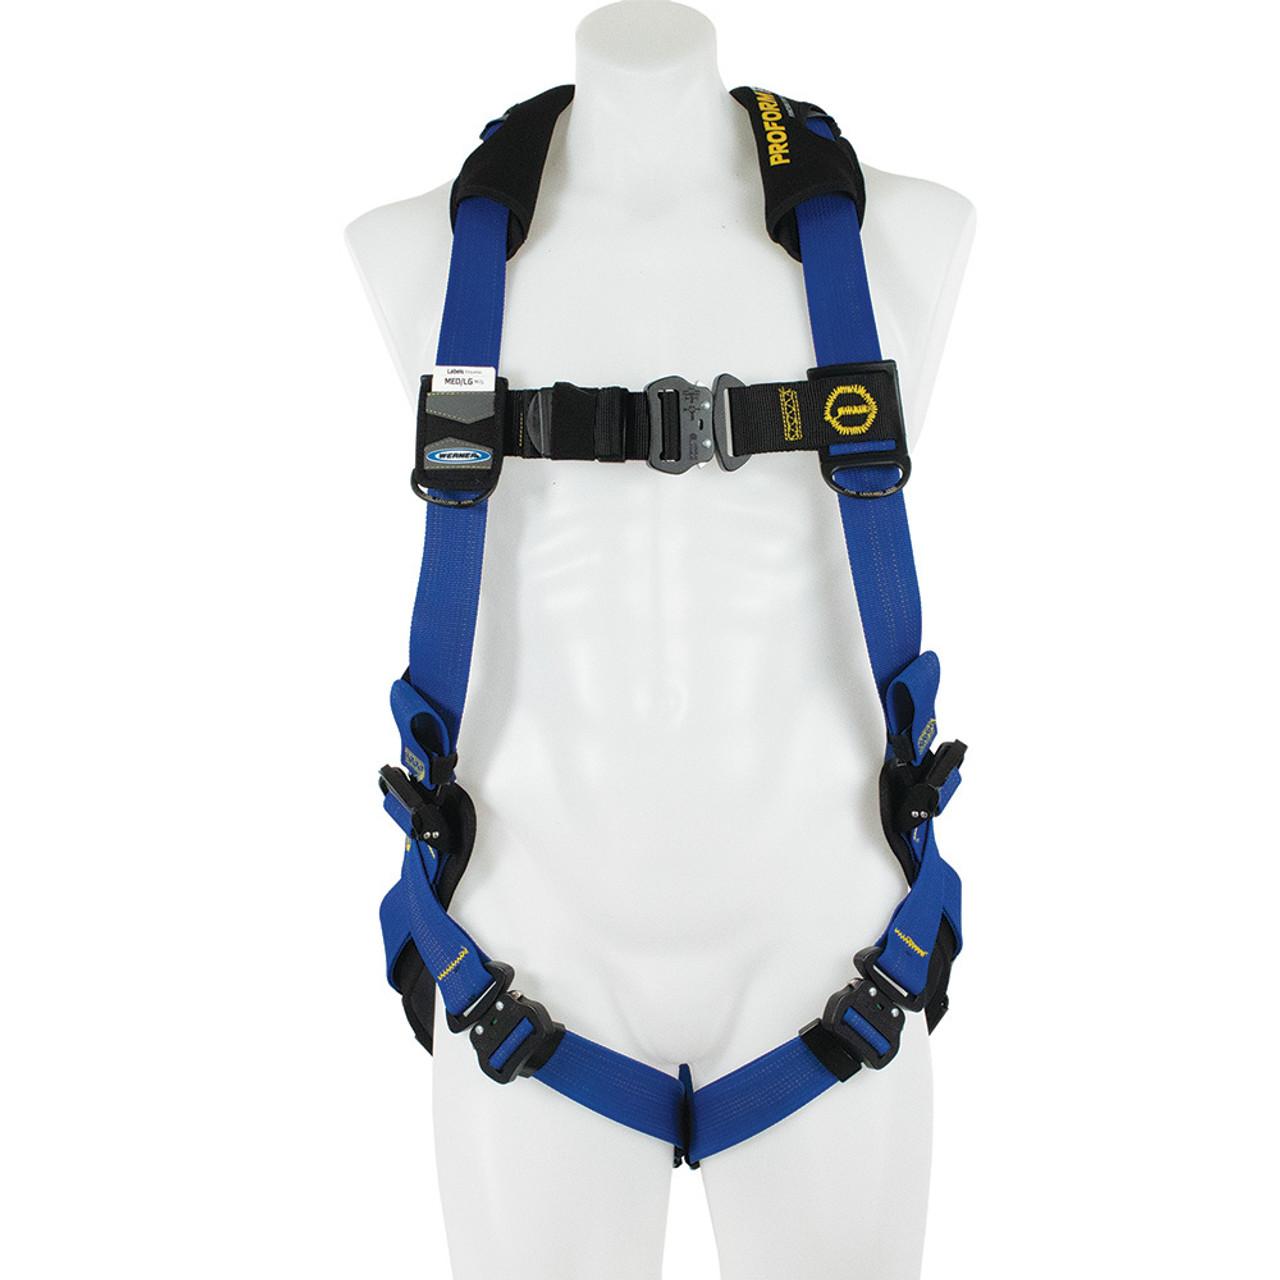 FP // Harnesses